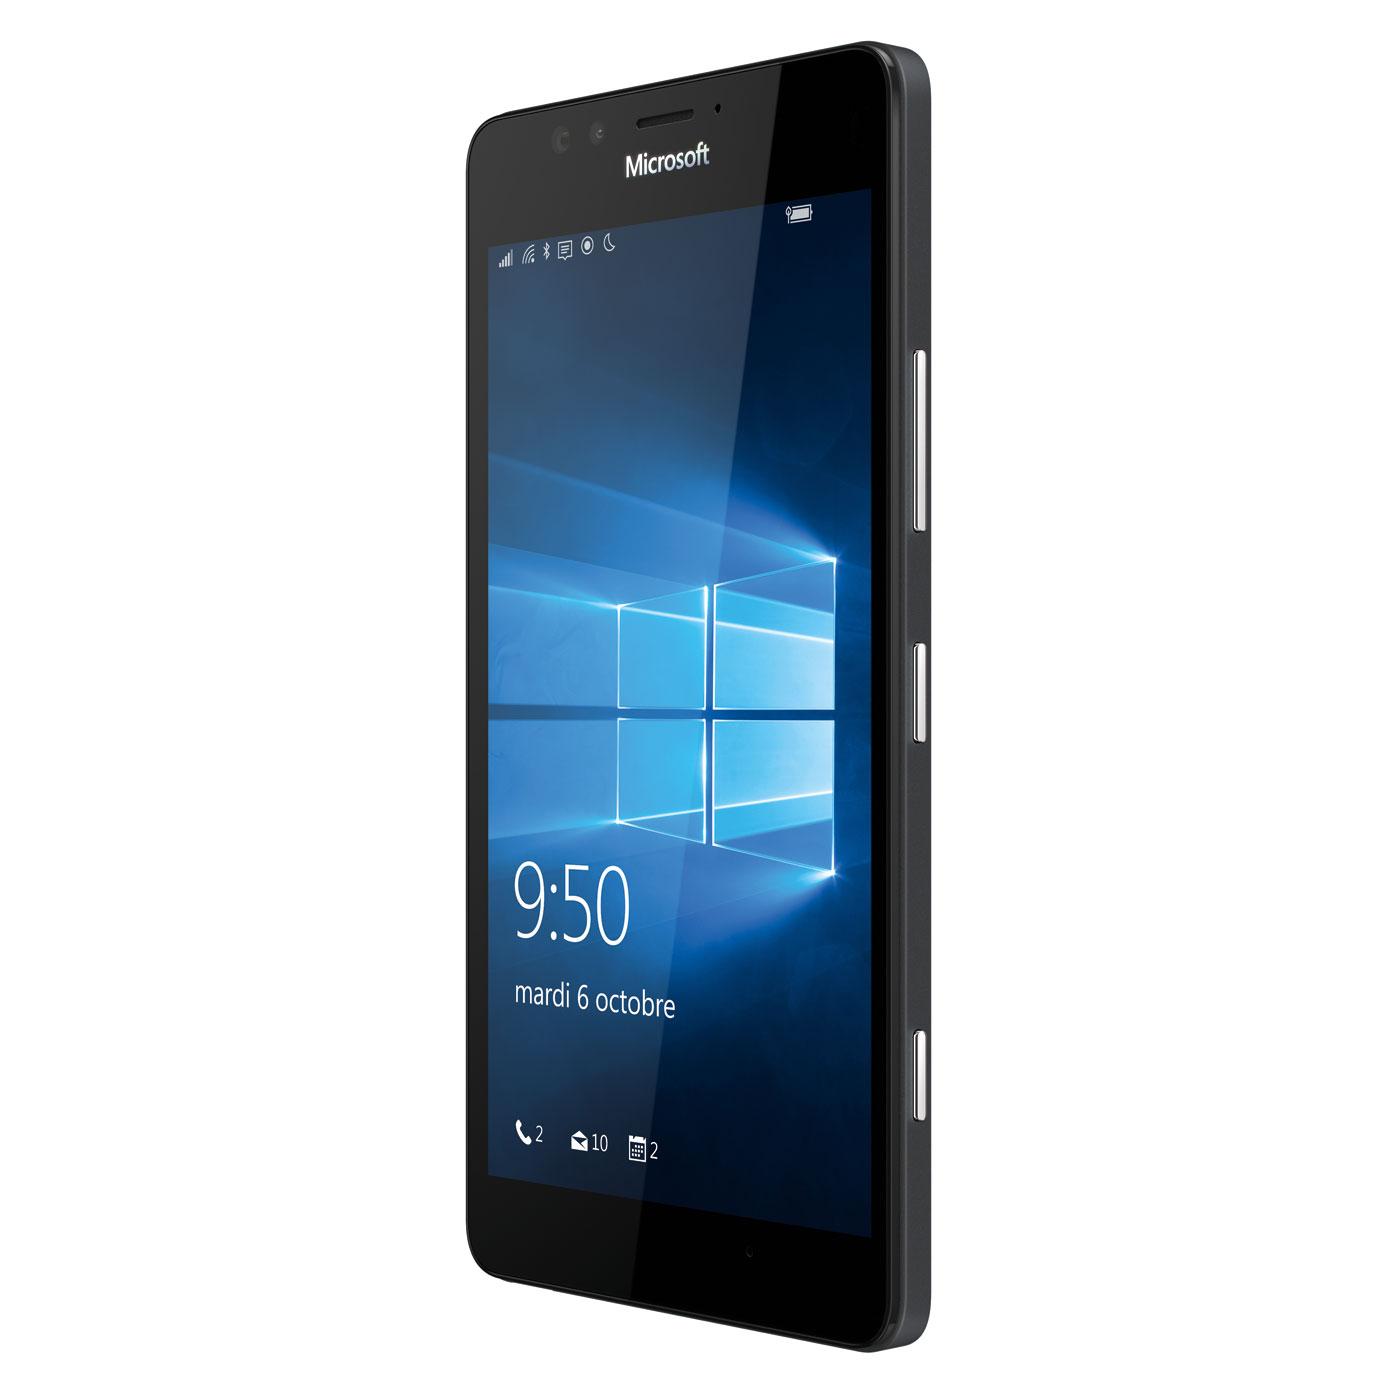 Microsoft Lumia 950 Dual SIM prix tunisie